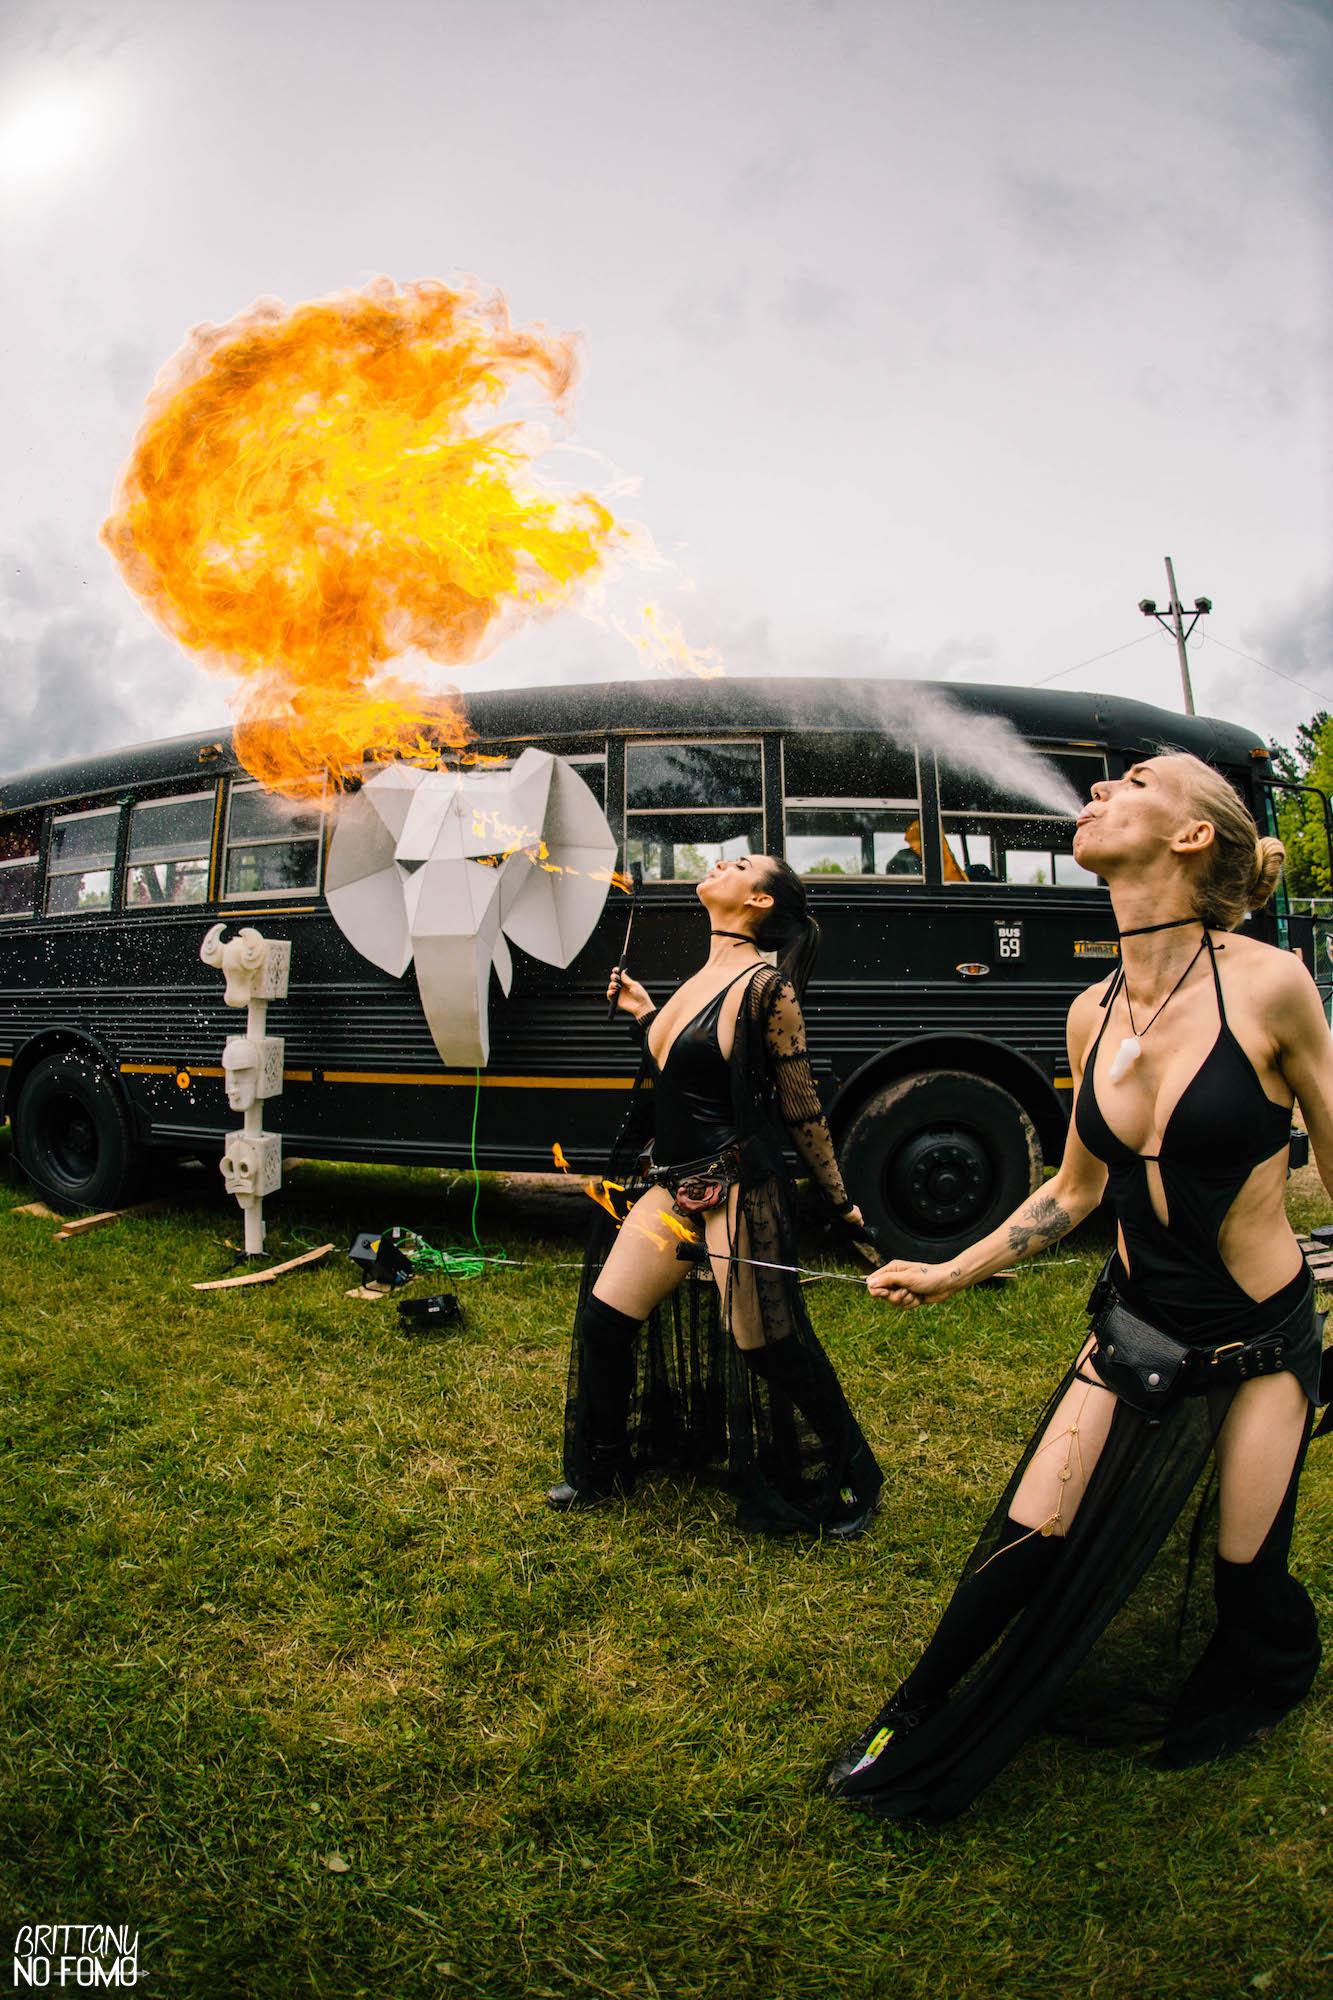 Elements Fest - Brittany NO FOMO1.jpg